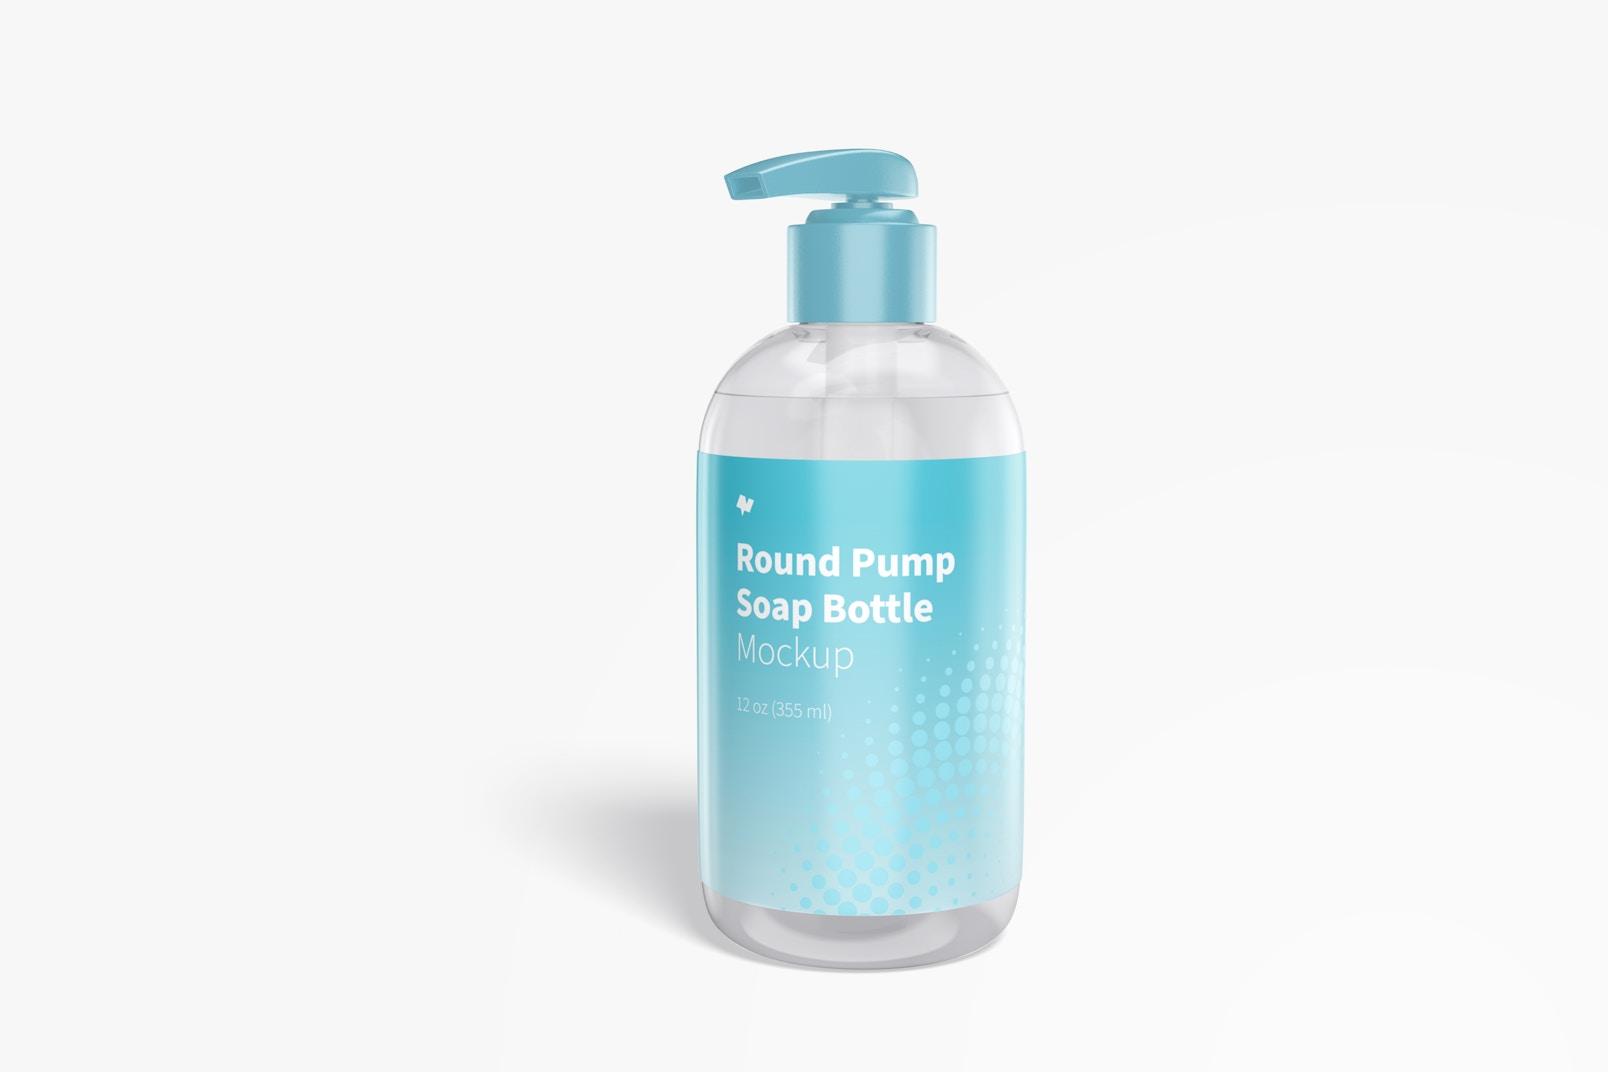 Round Pump Soap Bottle Mockup